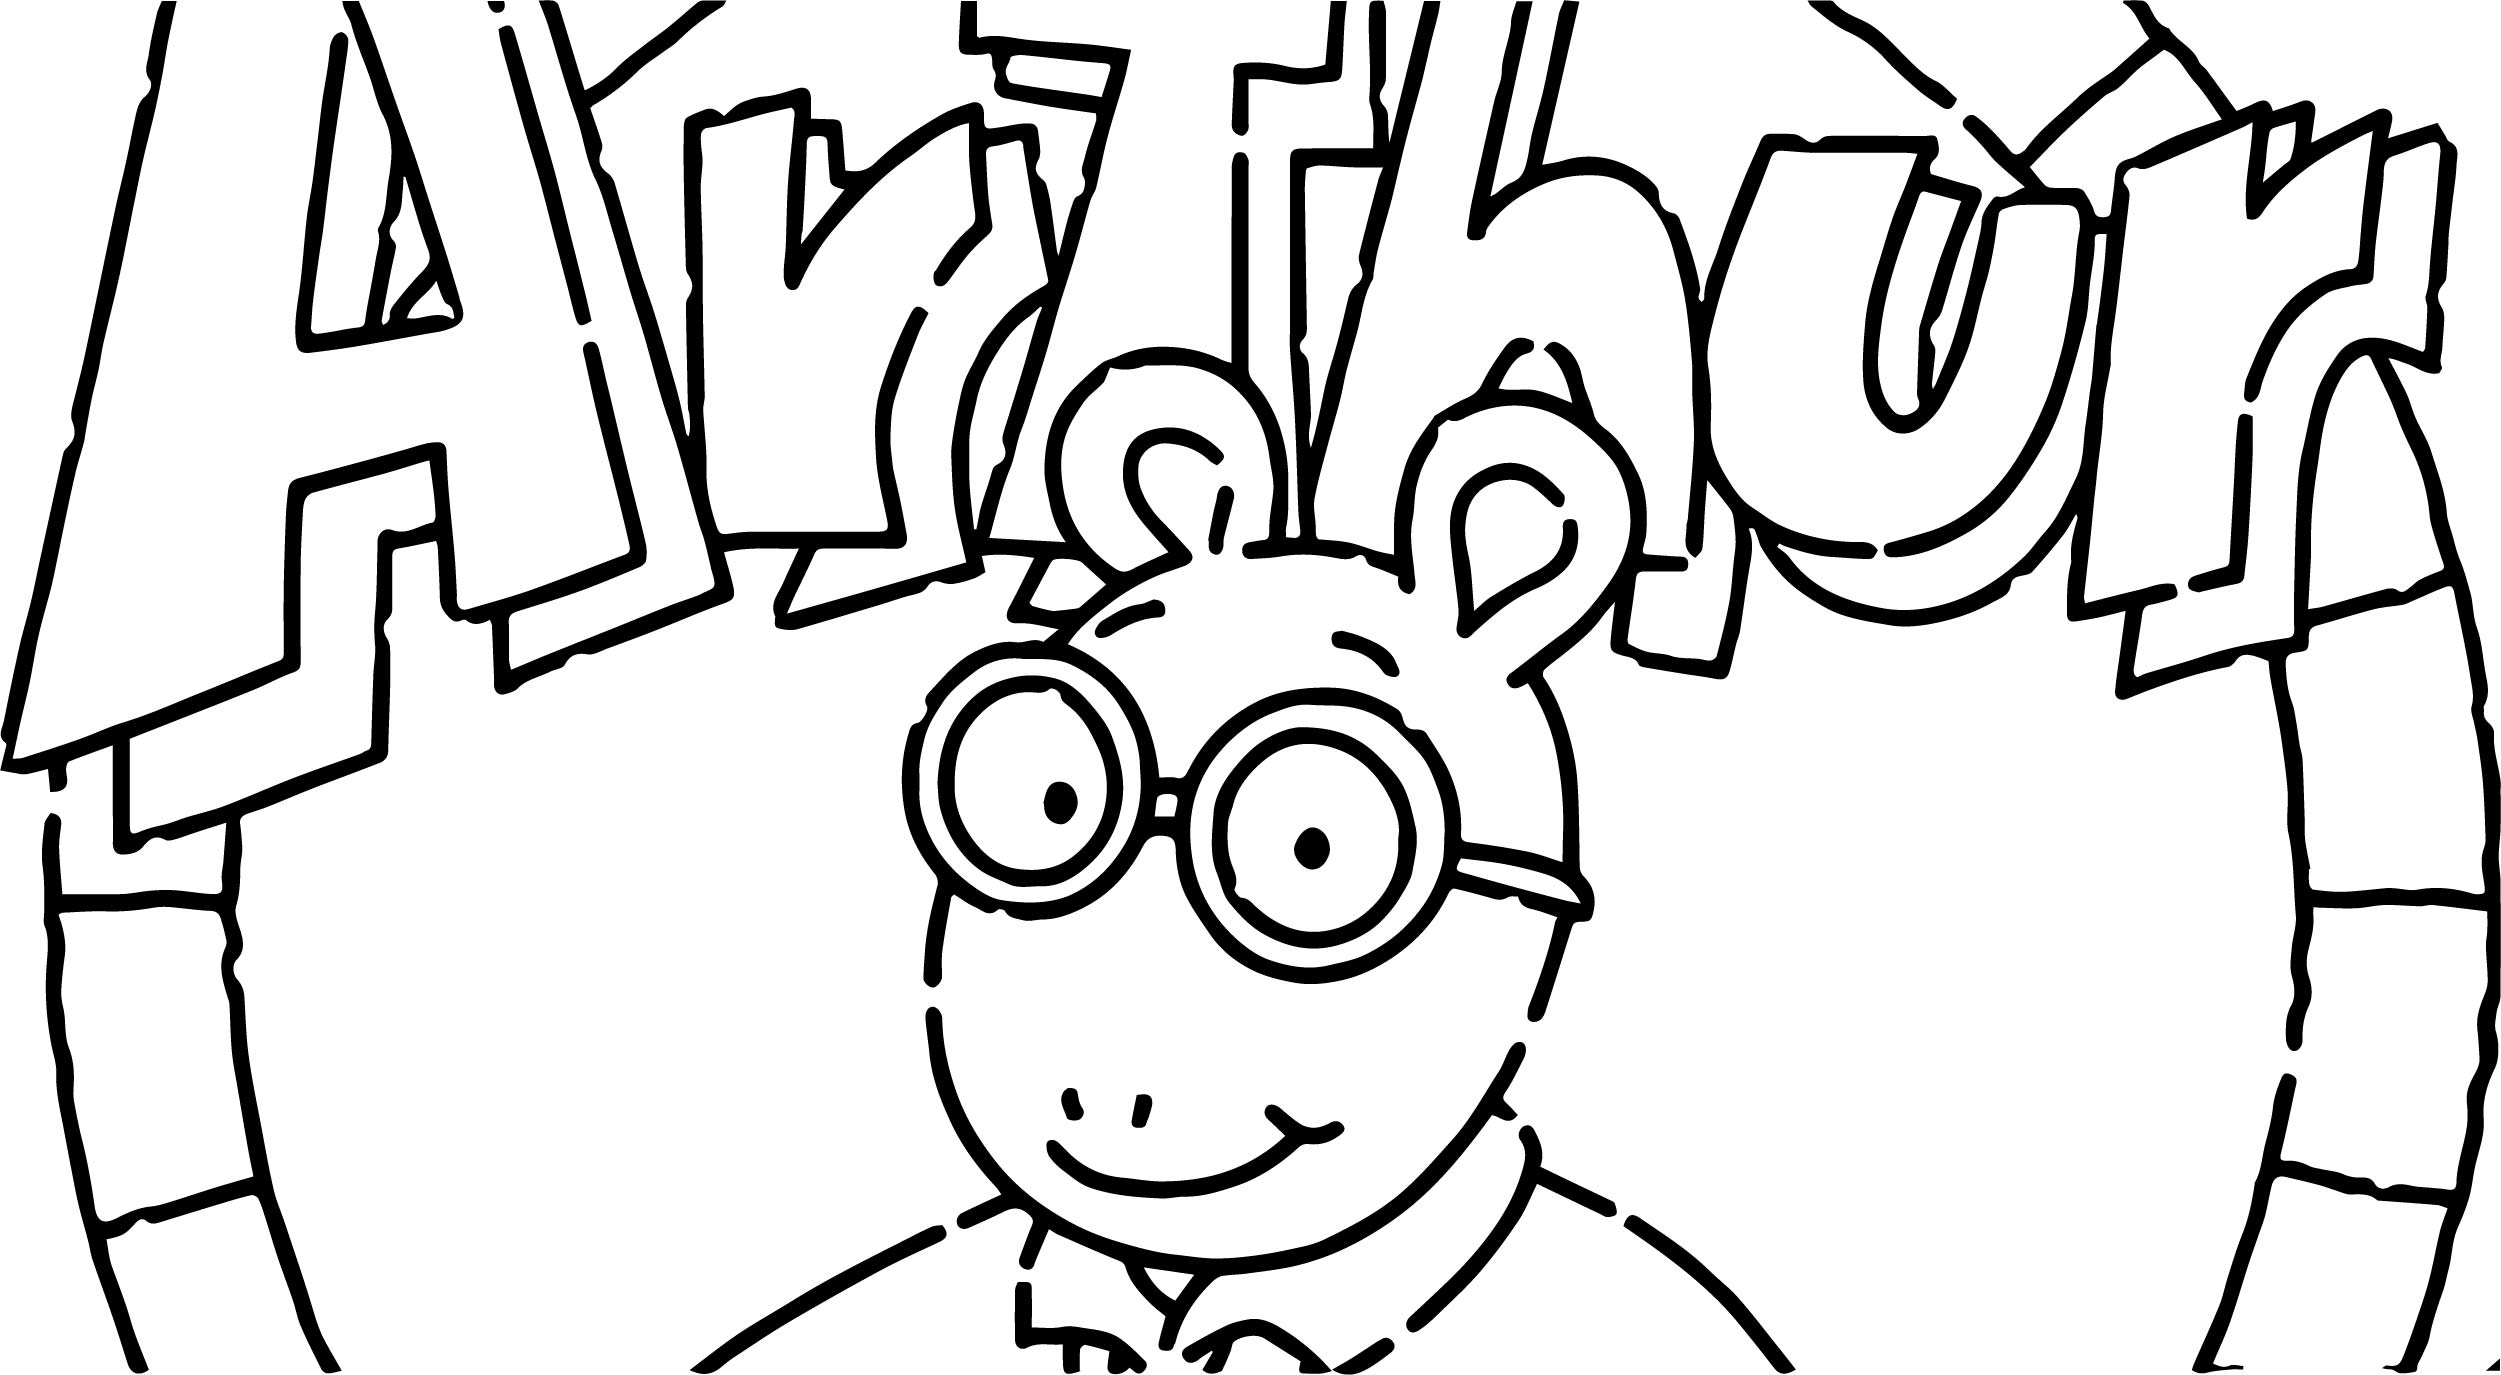 arthur logo lead coloring page